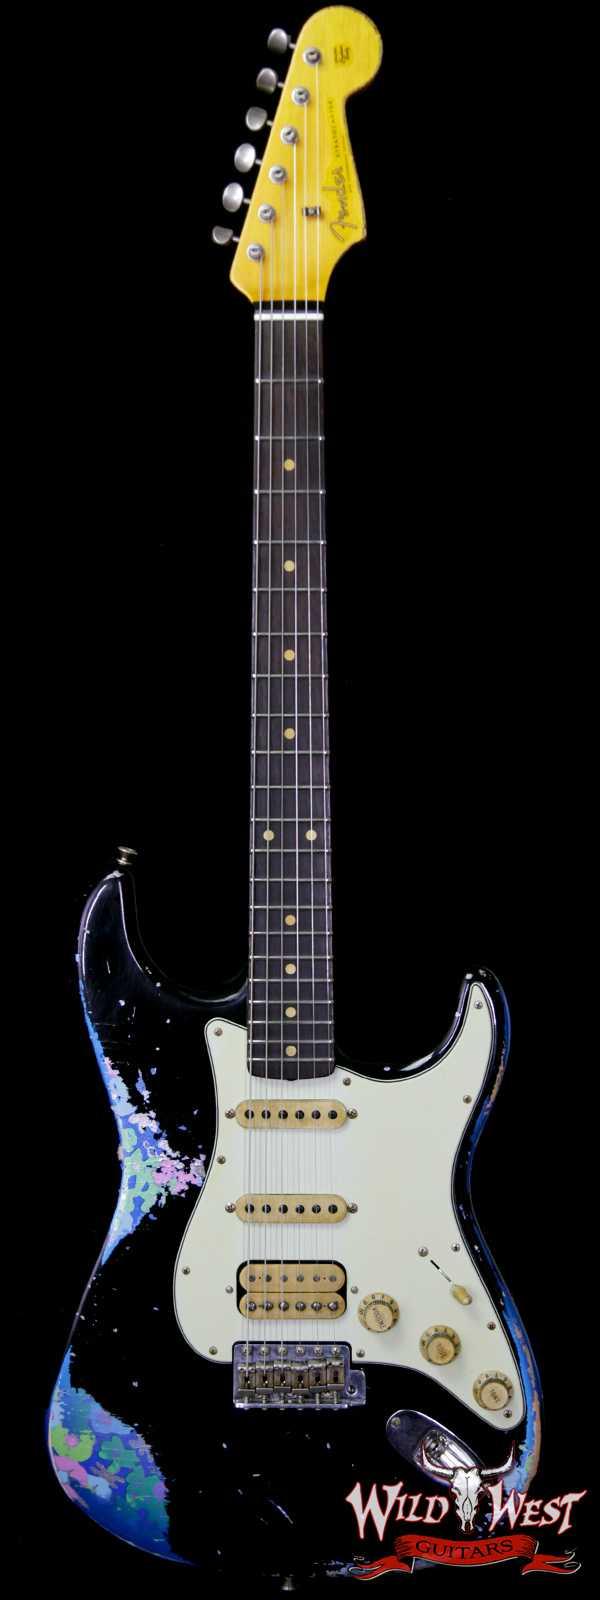 Fender Custom Shop Black Lightning 2.0 Stratocaster Heavy Relic HSS 21 Frets Rosewood Board Blue Flower